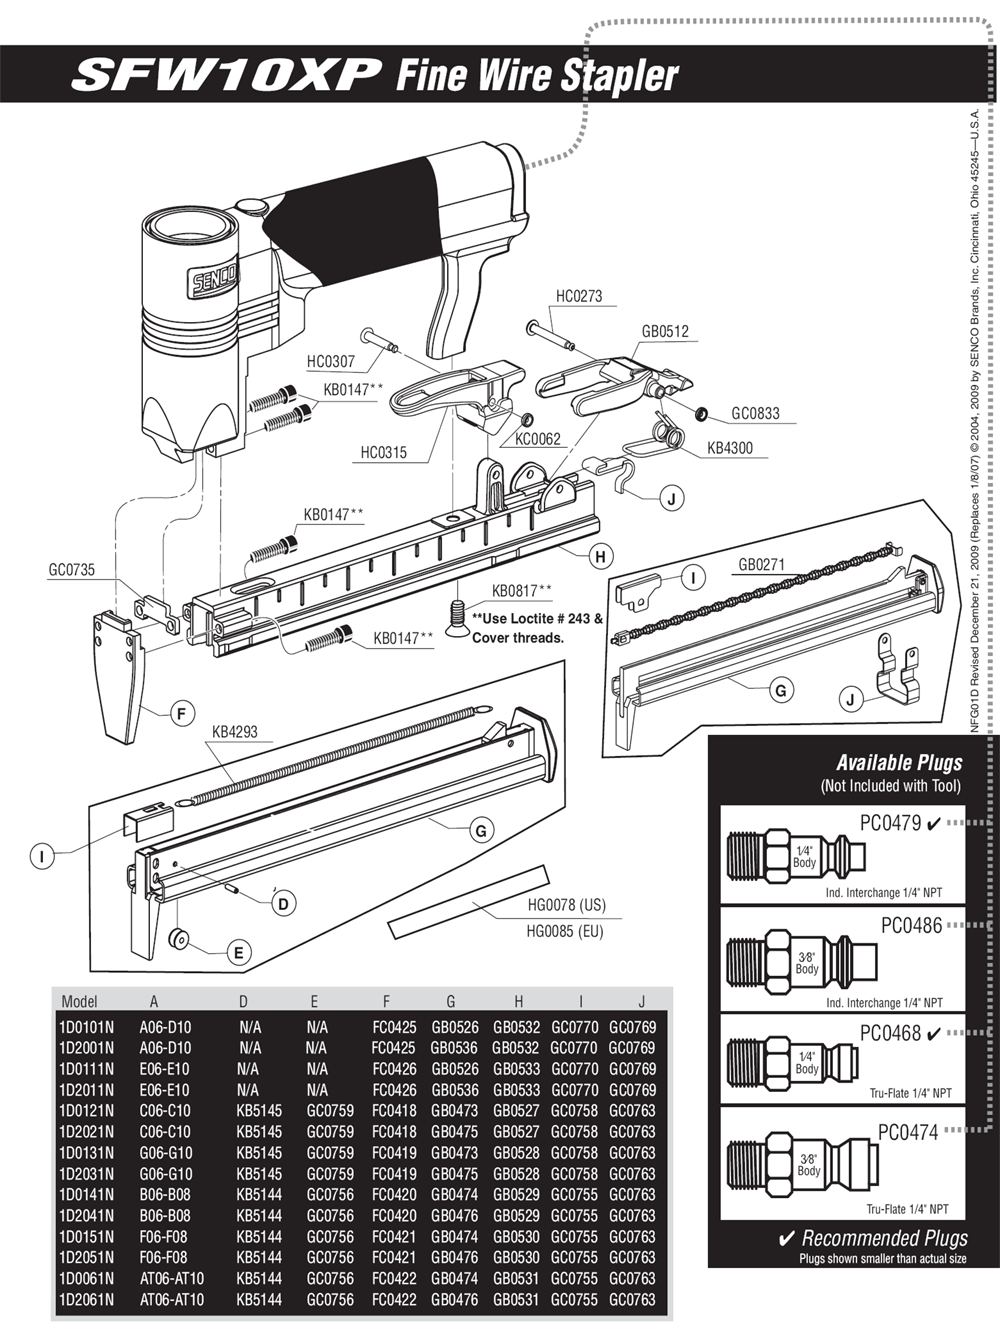 1D0151N-senco-PB-1Break Down